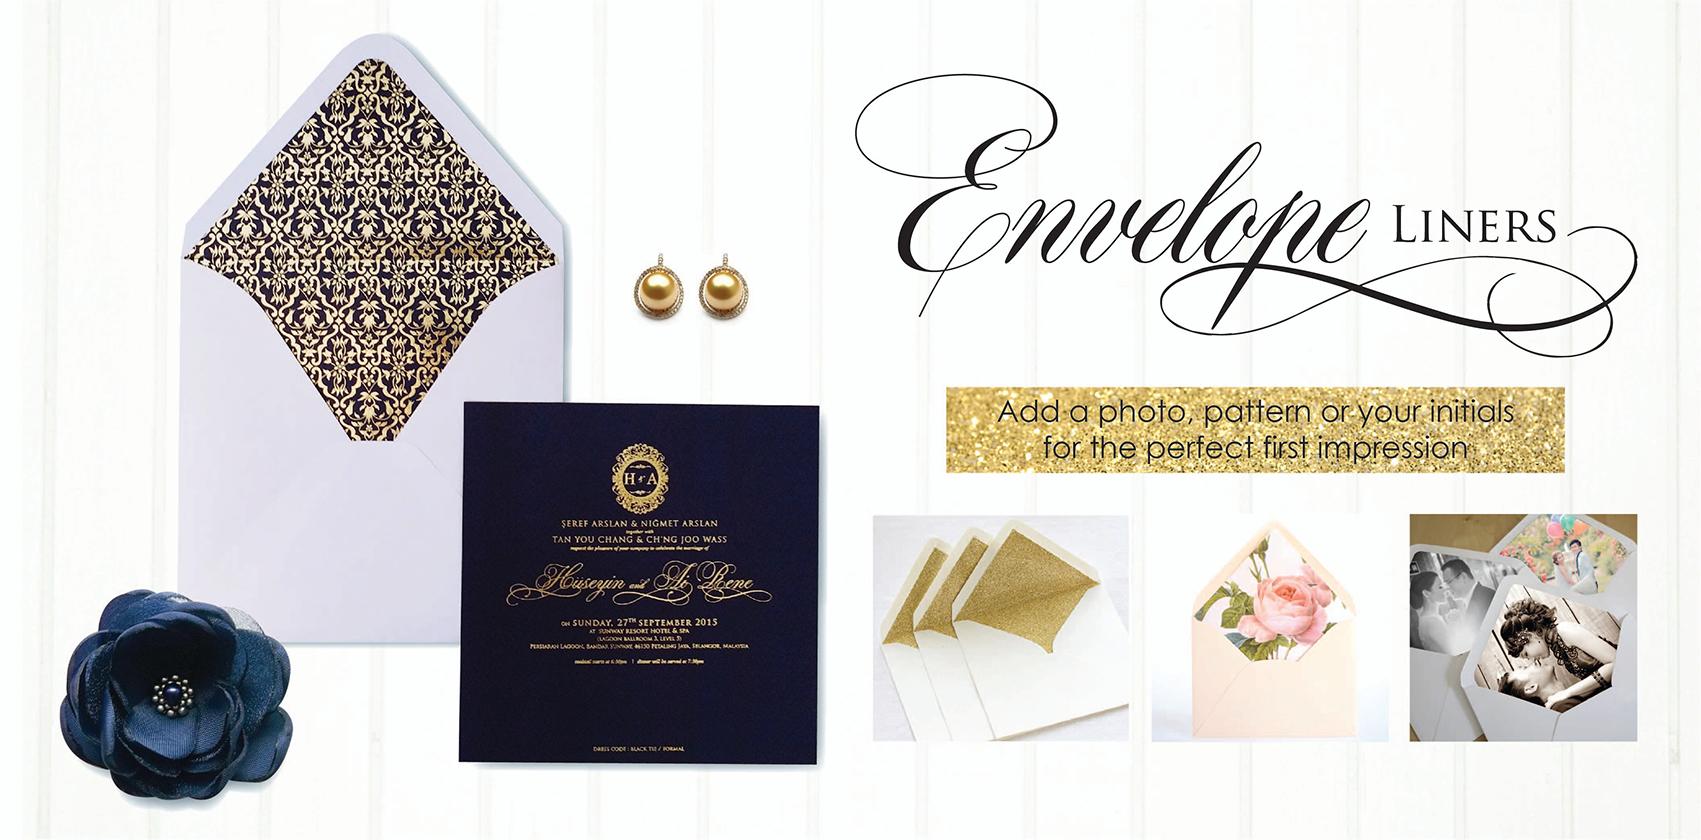 Wedding invitations invitation cards wedding vendors in malaysia wedding invitations invitation cards wedding vendors in malaysia bridestory stopboris Image collections